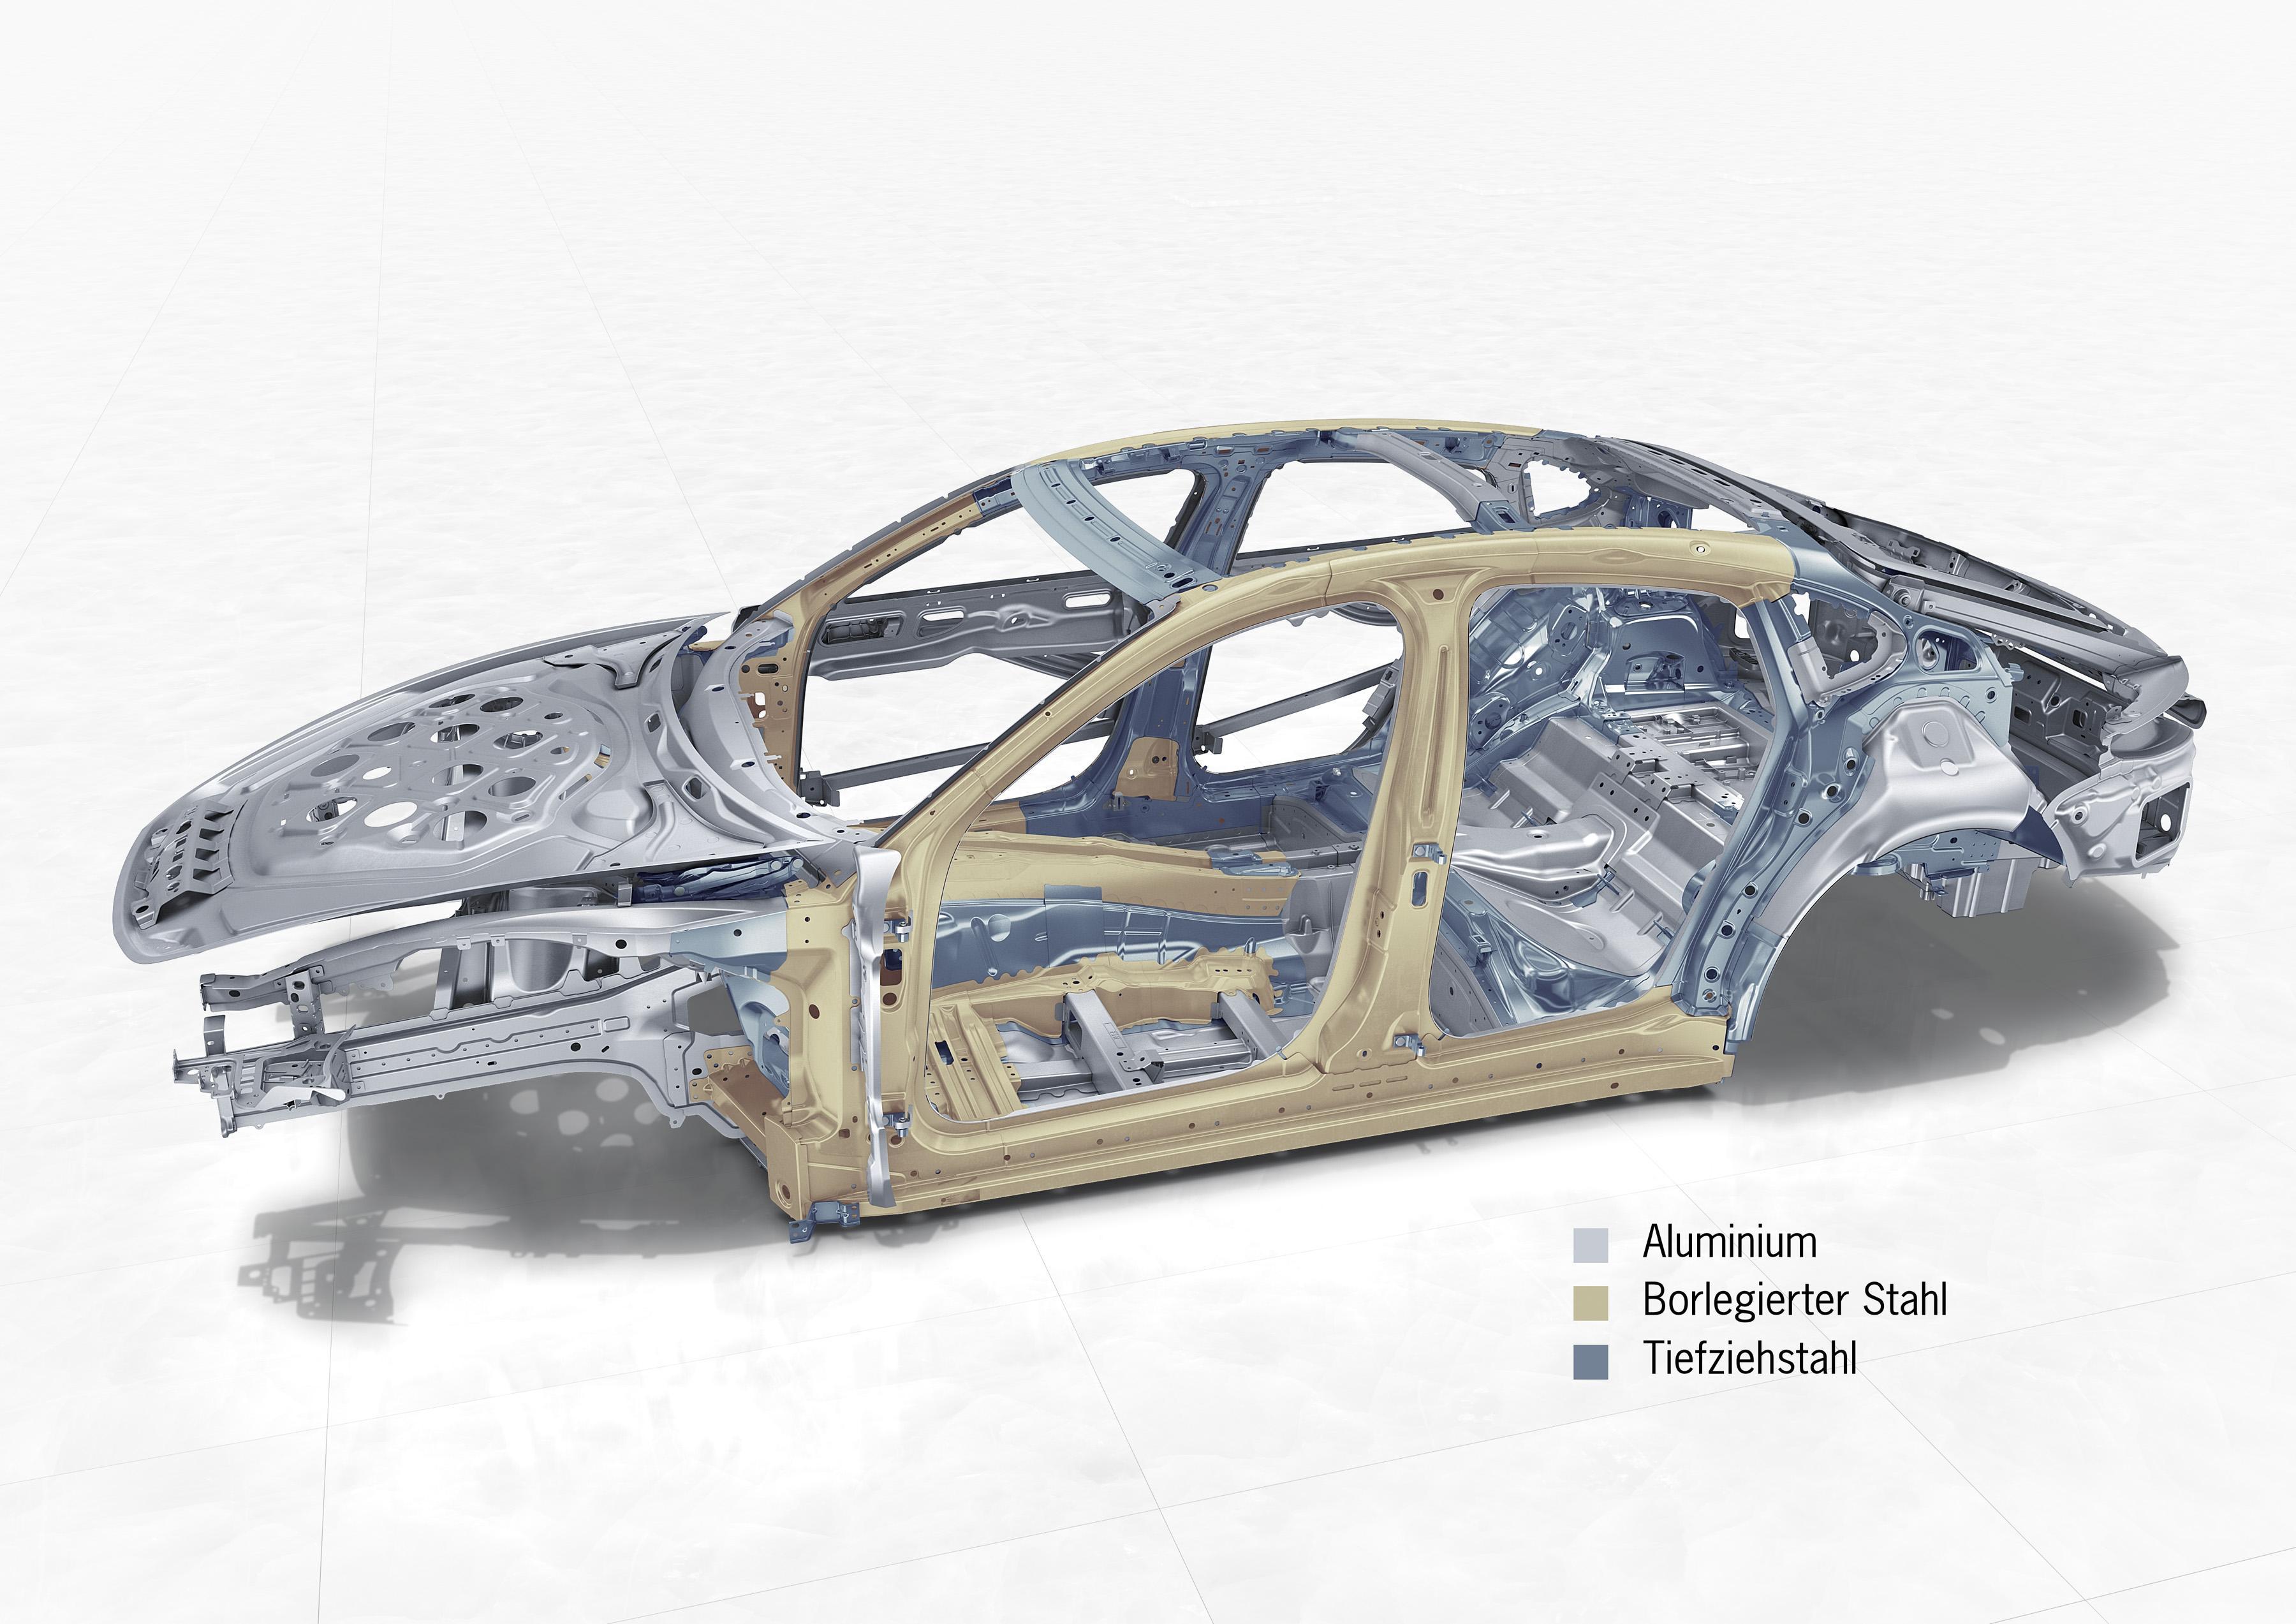 2017 Porsche Panamera body structure